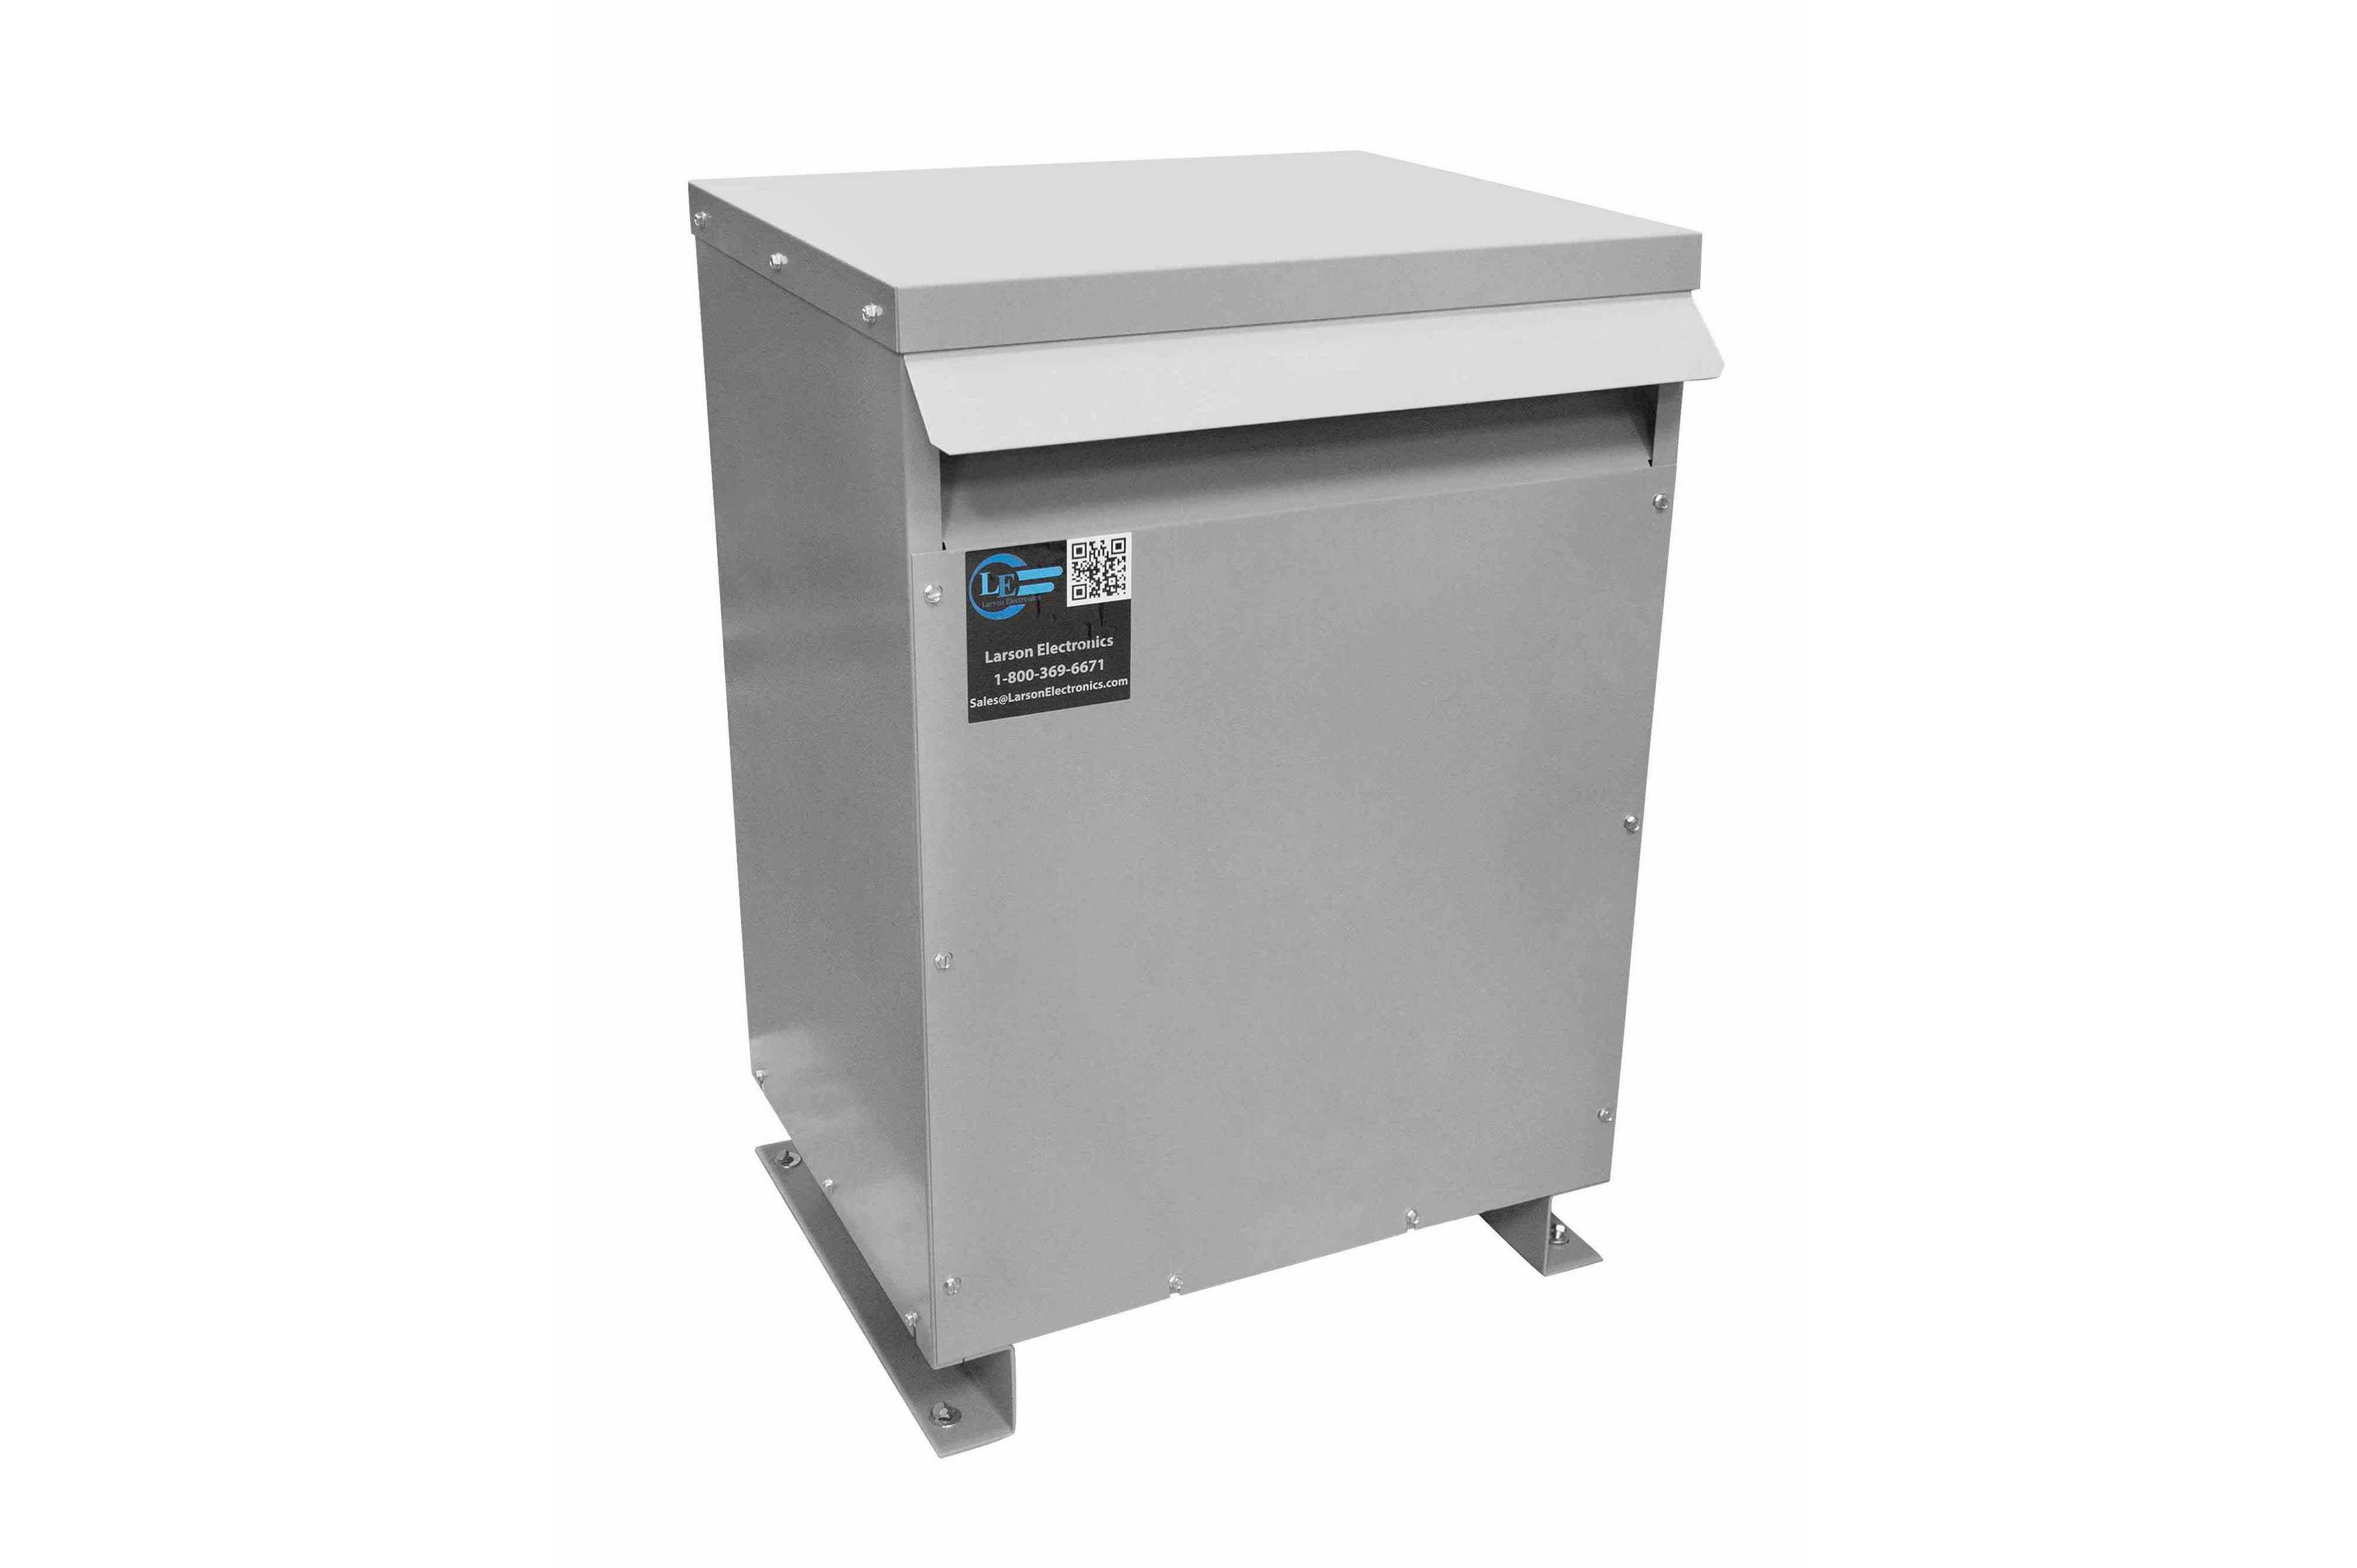 29 kVA 3PH Isolation Transformer, 380V Wye Primary, 208Y/120 Wye-N Secondary, N3R, Ventilated, 60 Hz